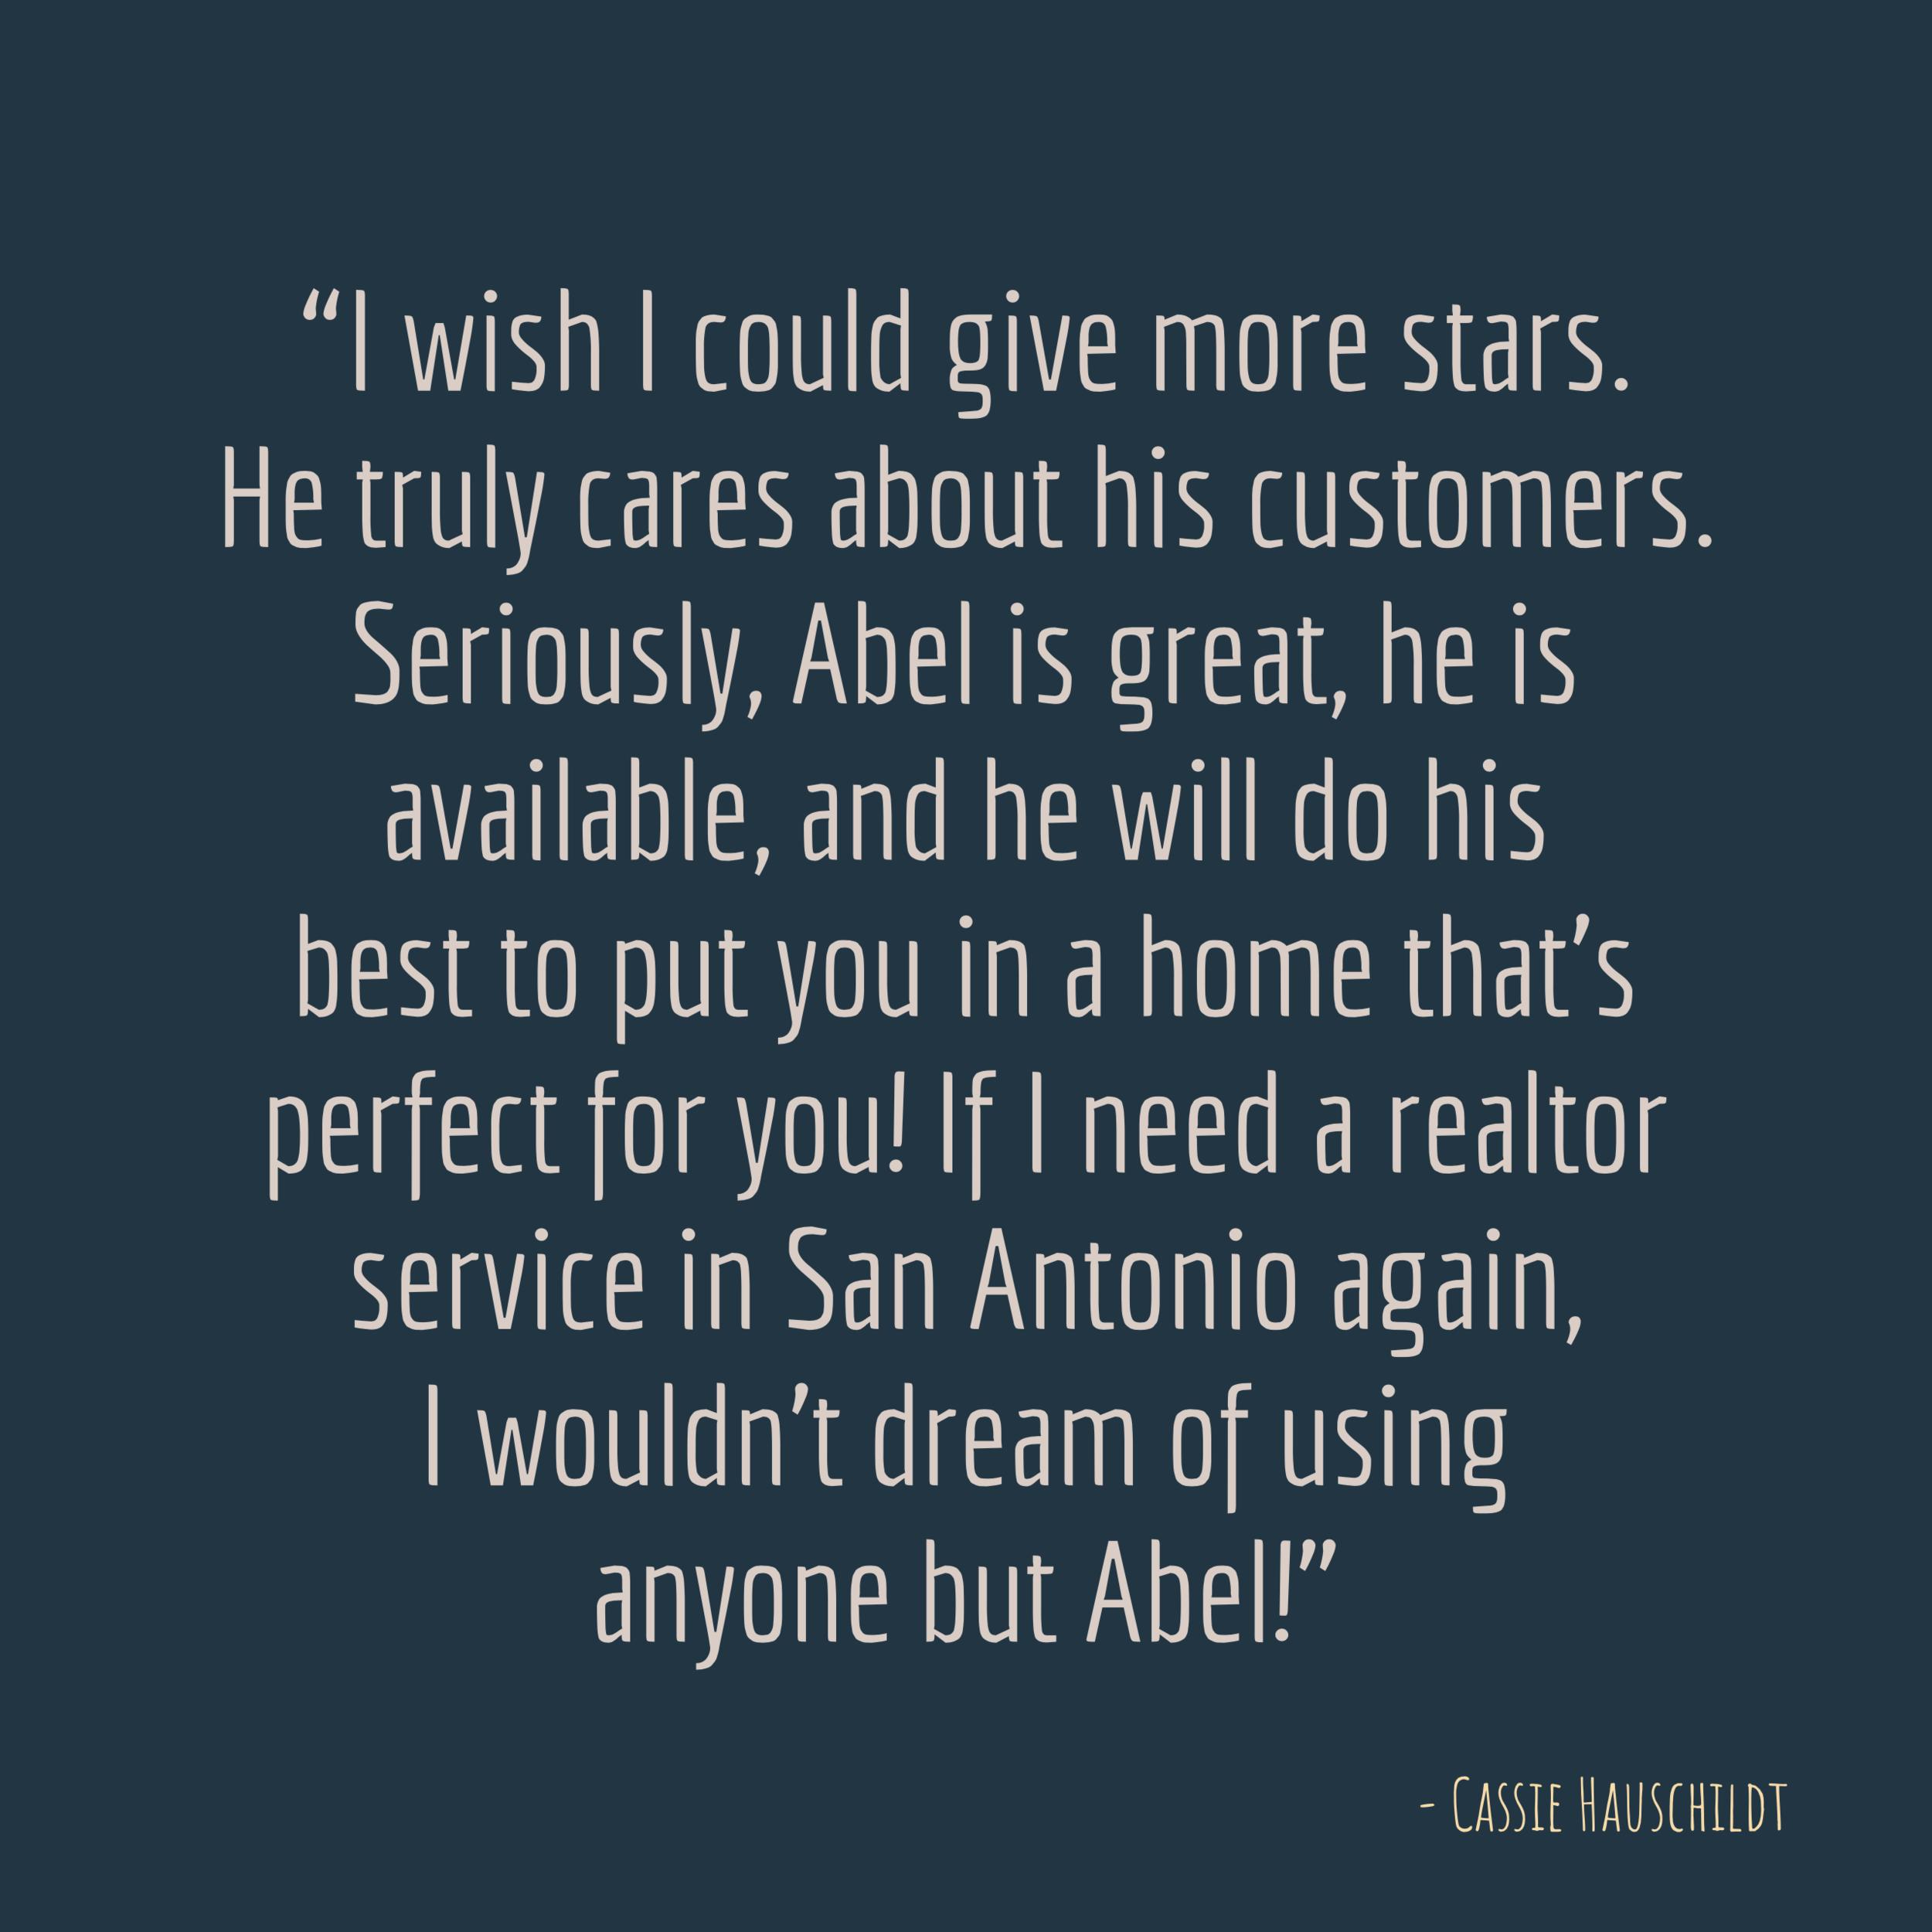 Abel Contreras Review